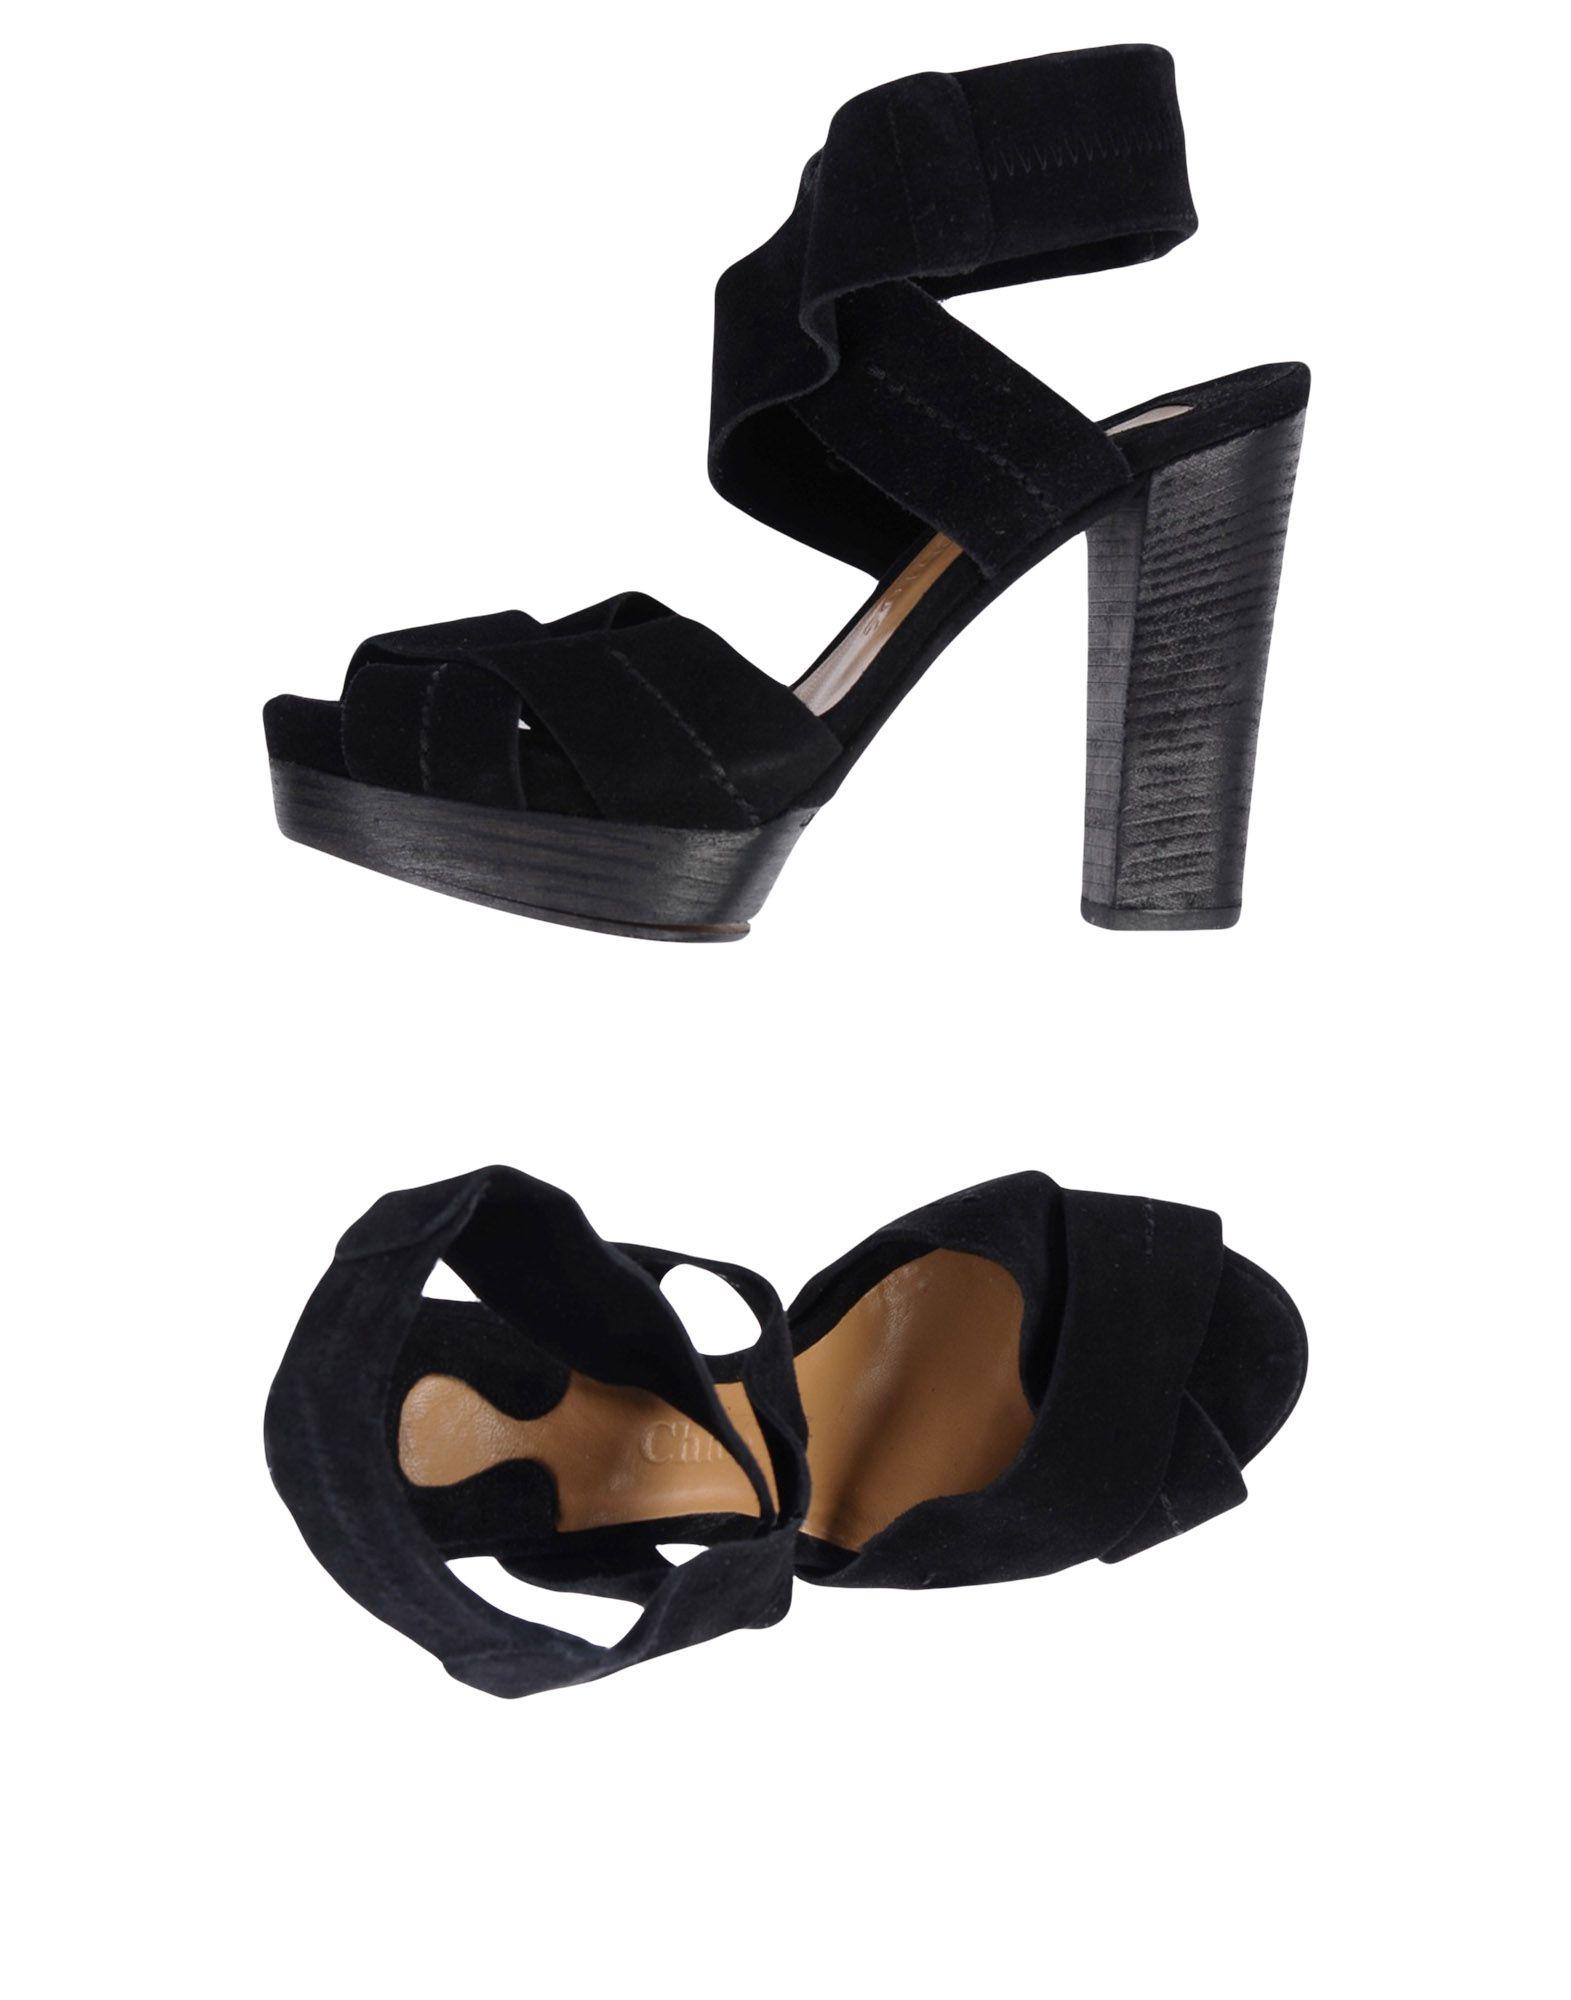 CHLOÉ Damen Sandale Farbe Schwarz Größe 6